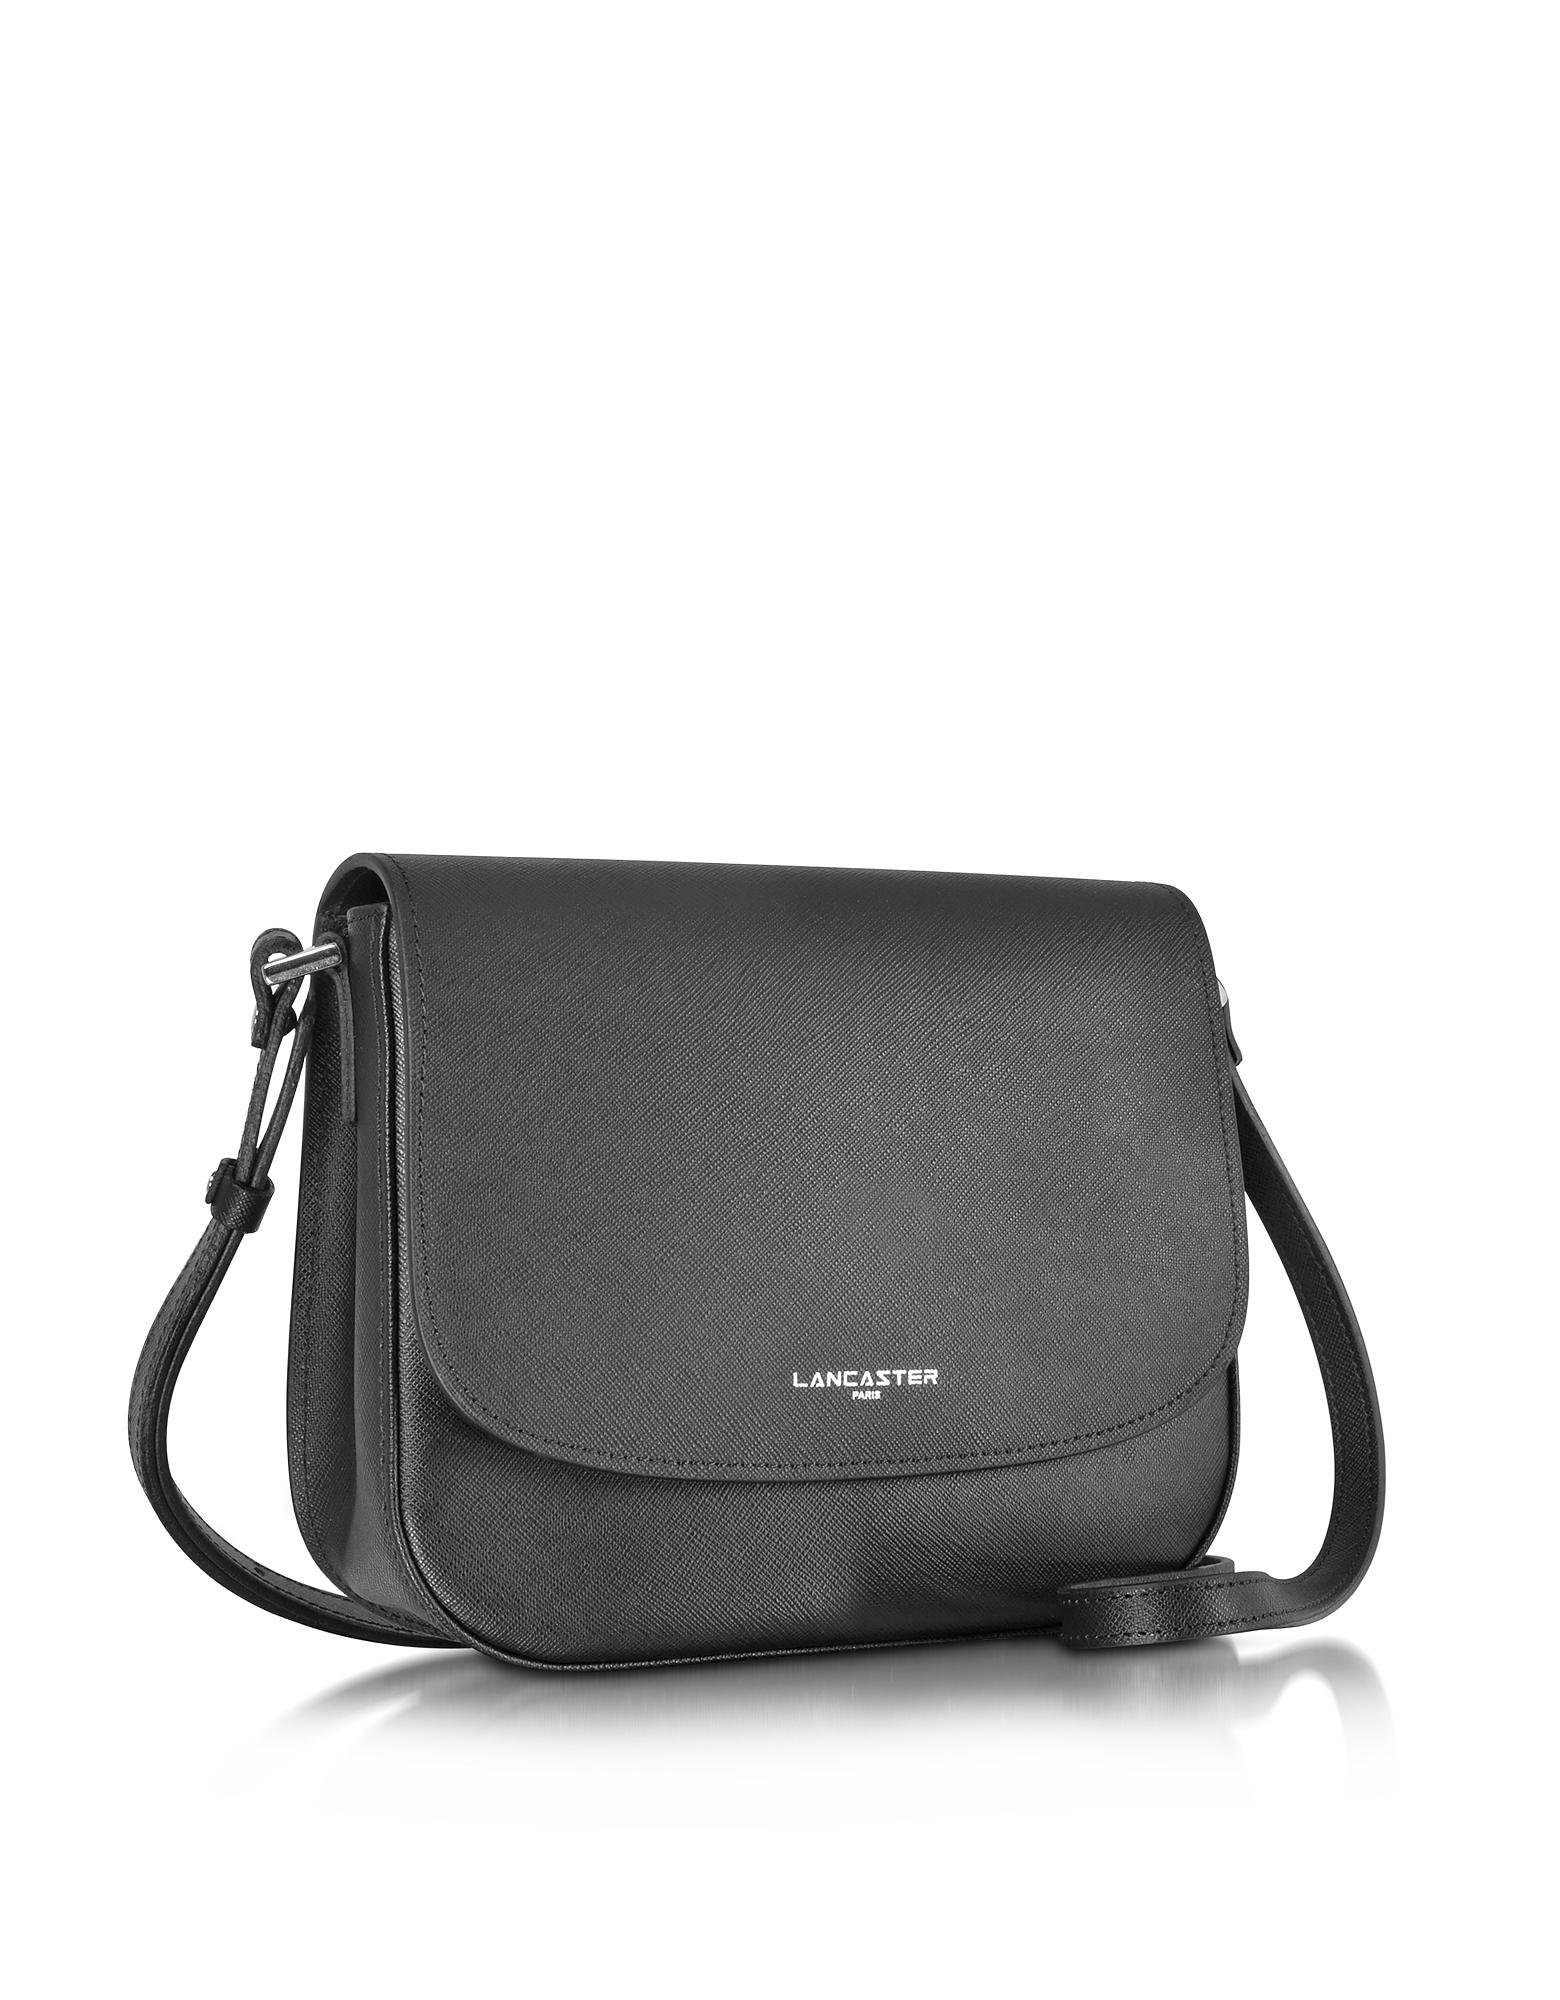 64aeef07f3a1 Lancaster Paris Adele Saffiano Leather Crossbody Bag in Black - Lyst